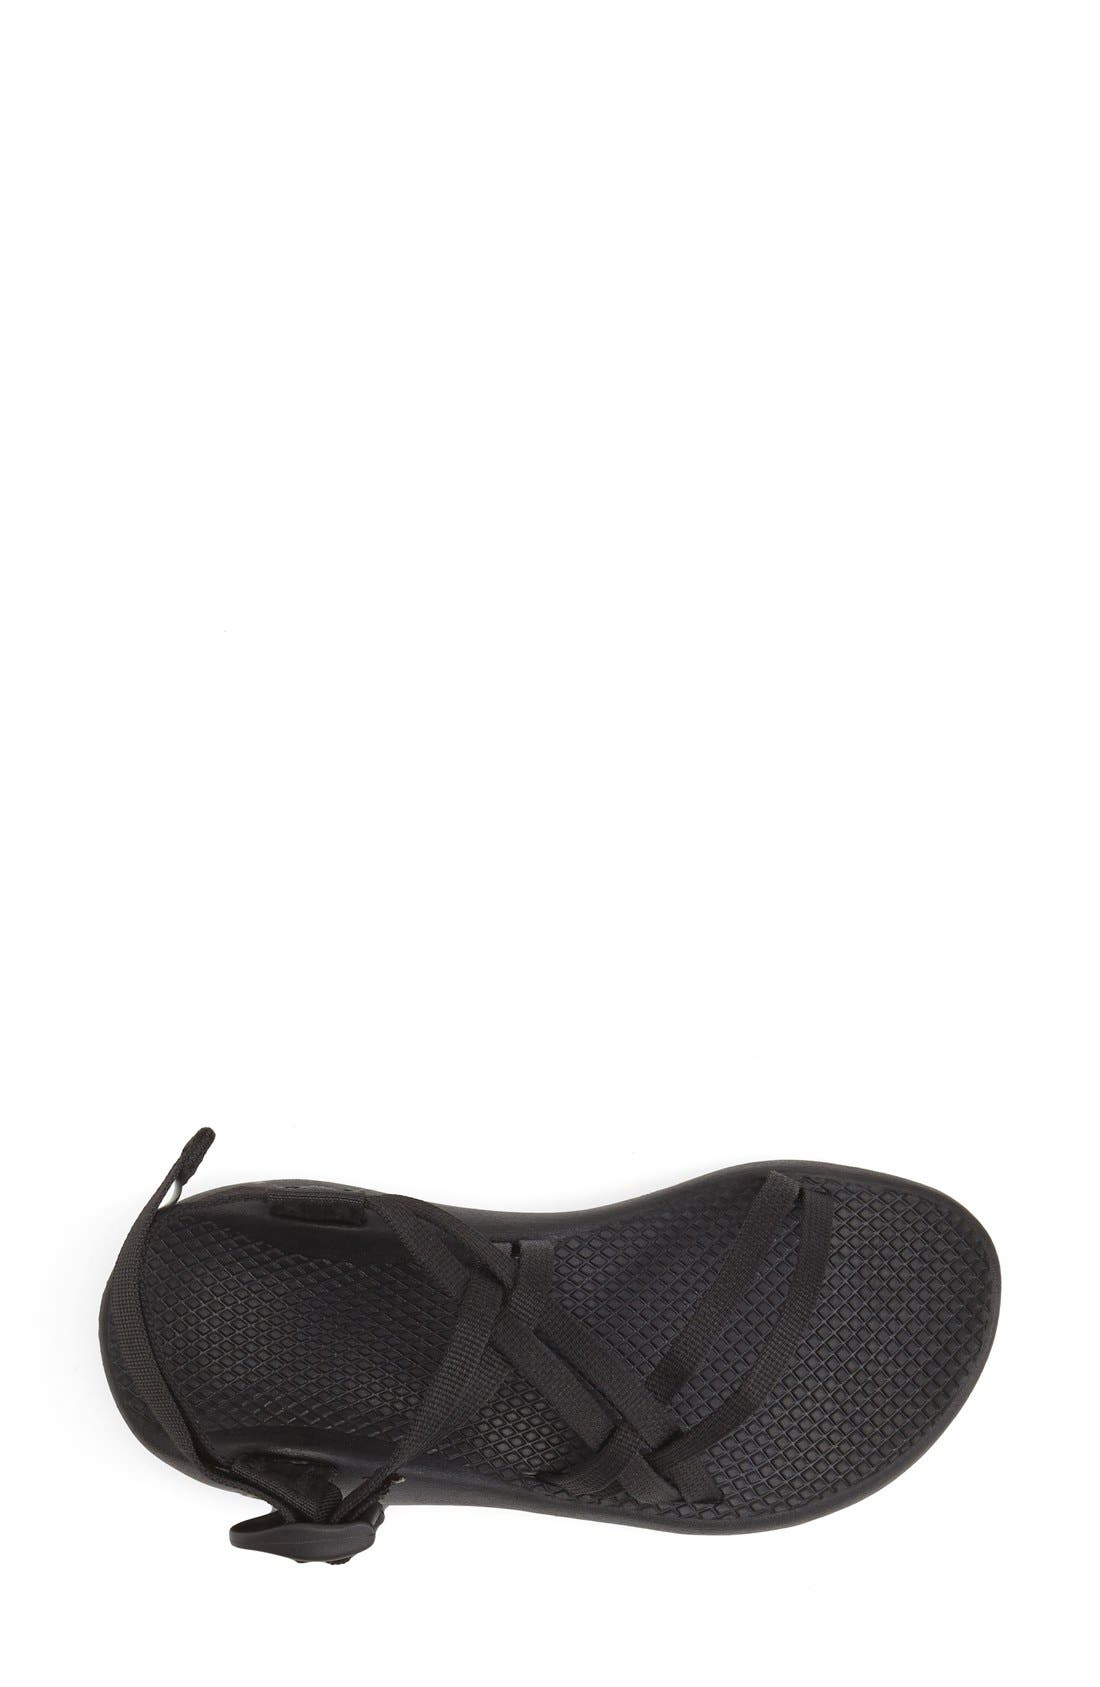 Alternate Image 4  - Chaco 'ZX1 Yampa' Double Strap Sport Sandal (Women)